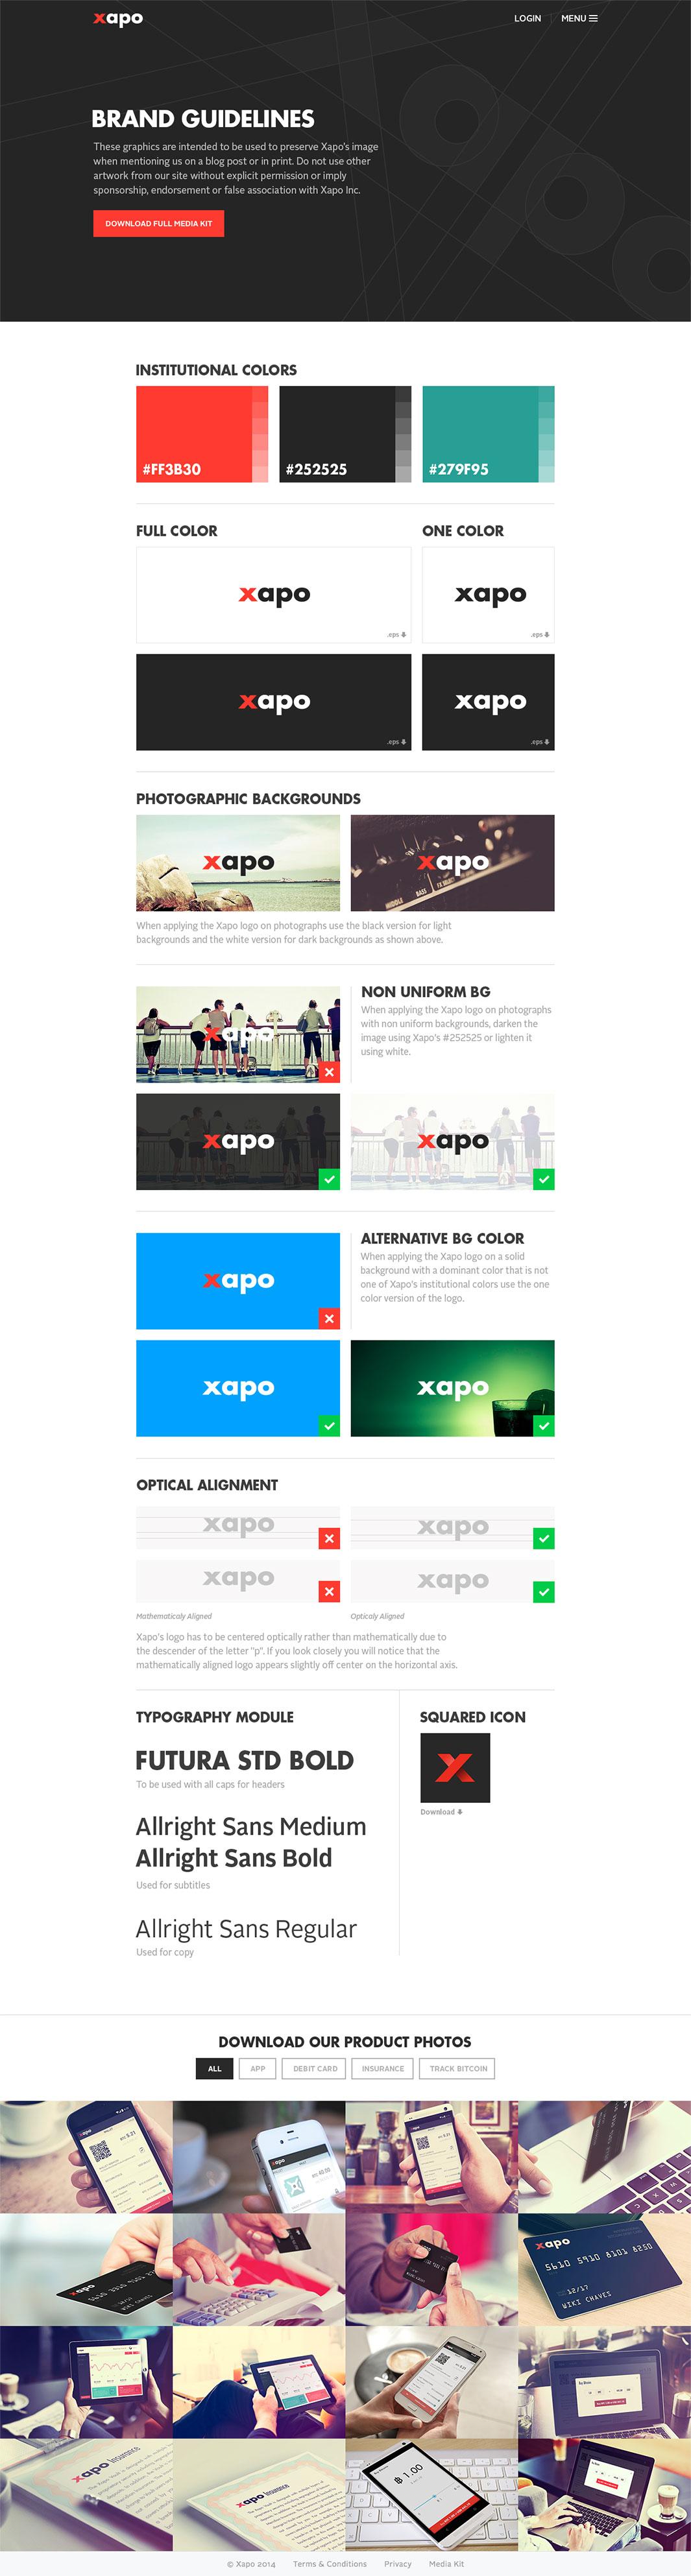 Xapo - Branding & Web Design Case Study | Aerolab